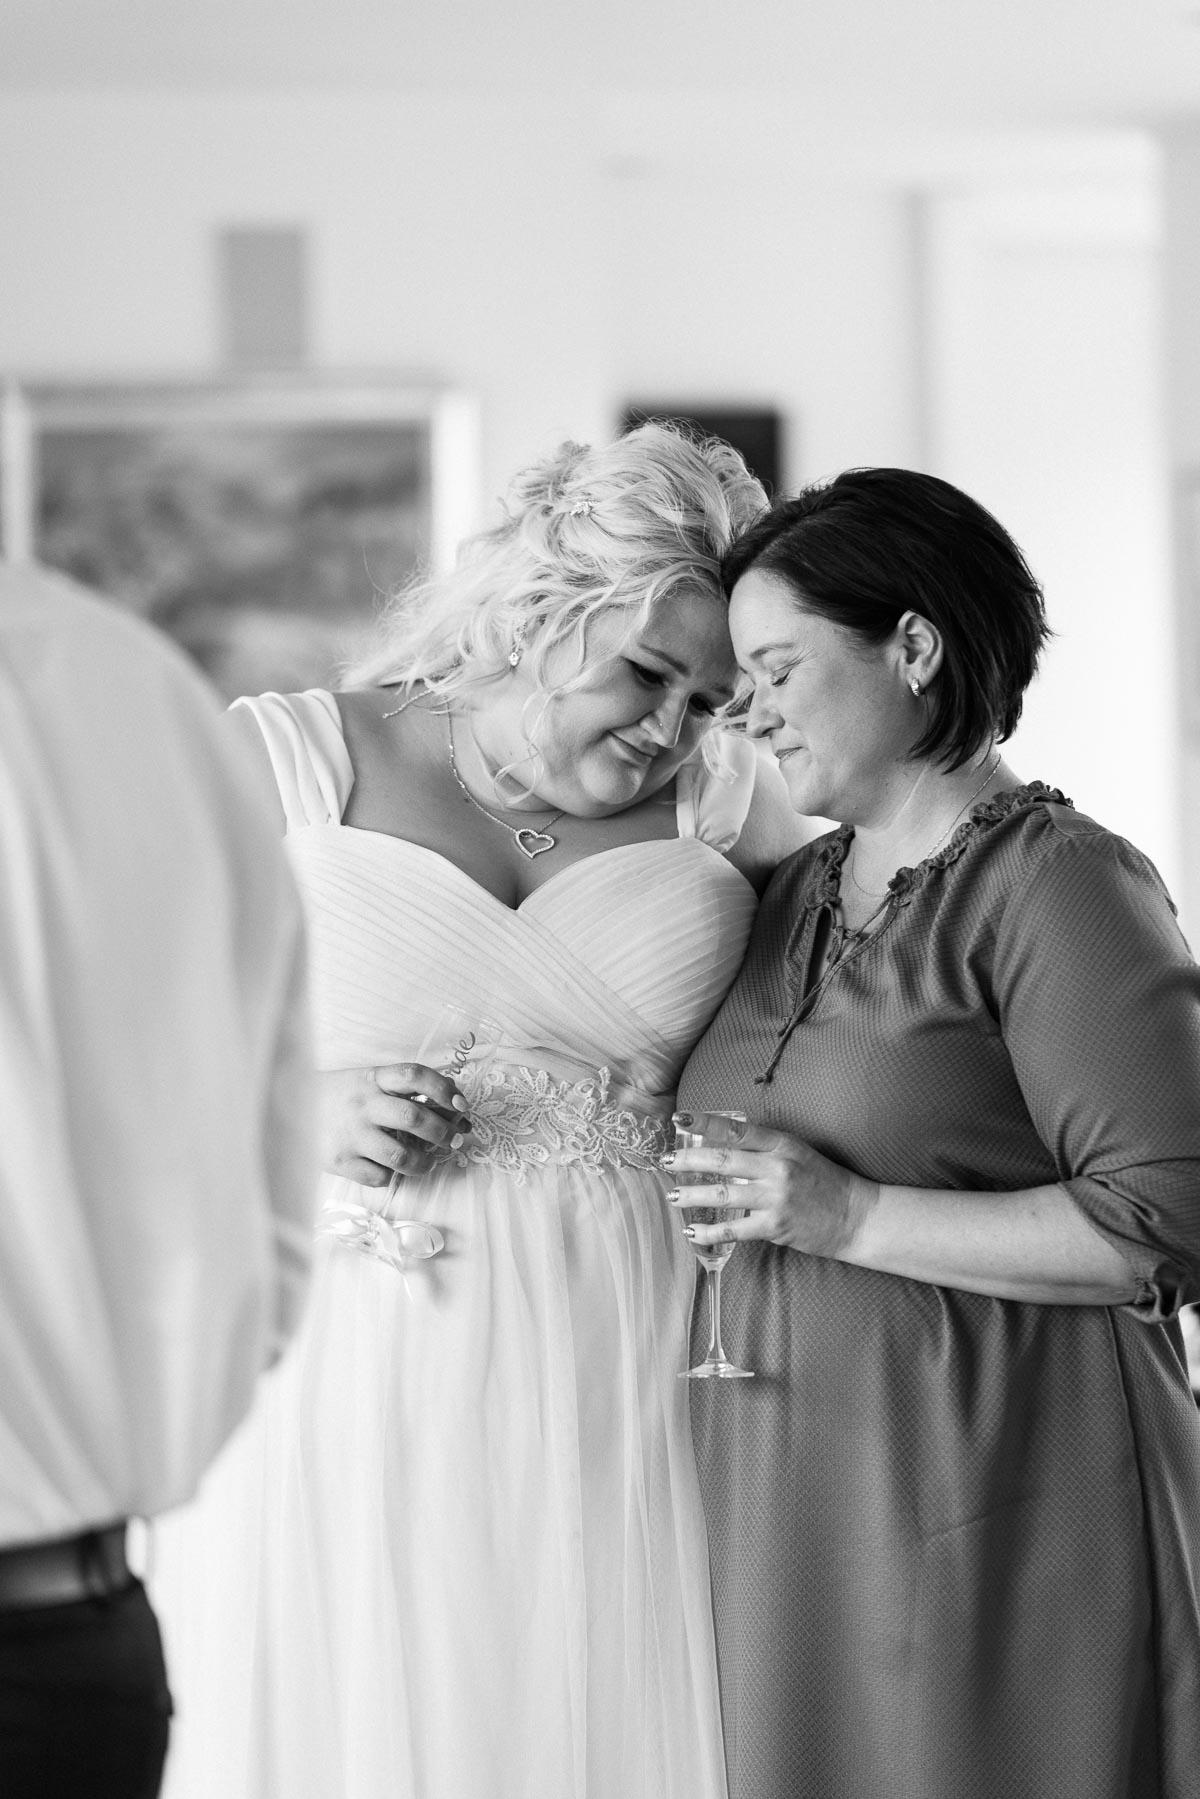 mt-eliza-mornington-peninsula-backyard-wedding-heart+soul-weddings-allison-matt-03673.jpg